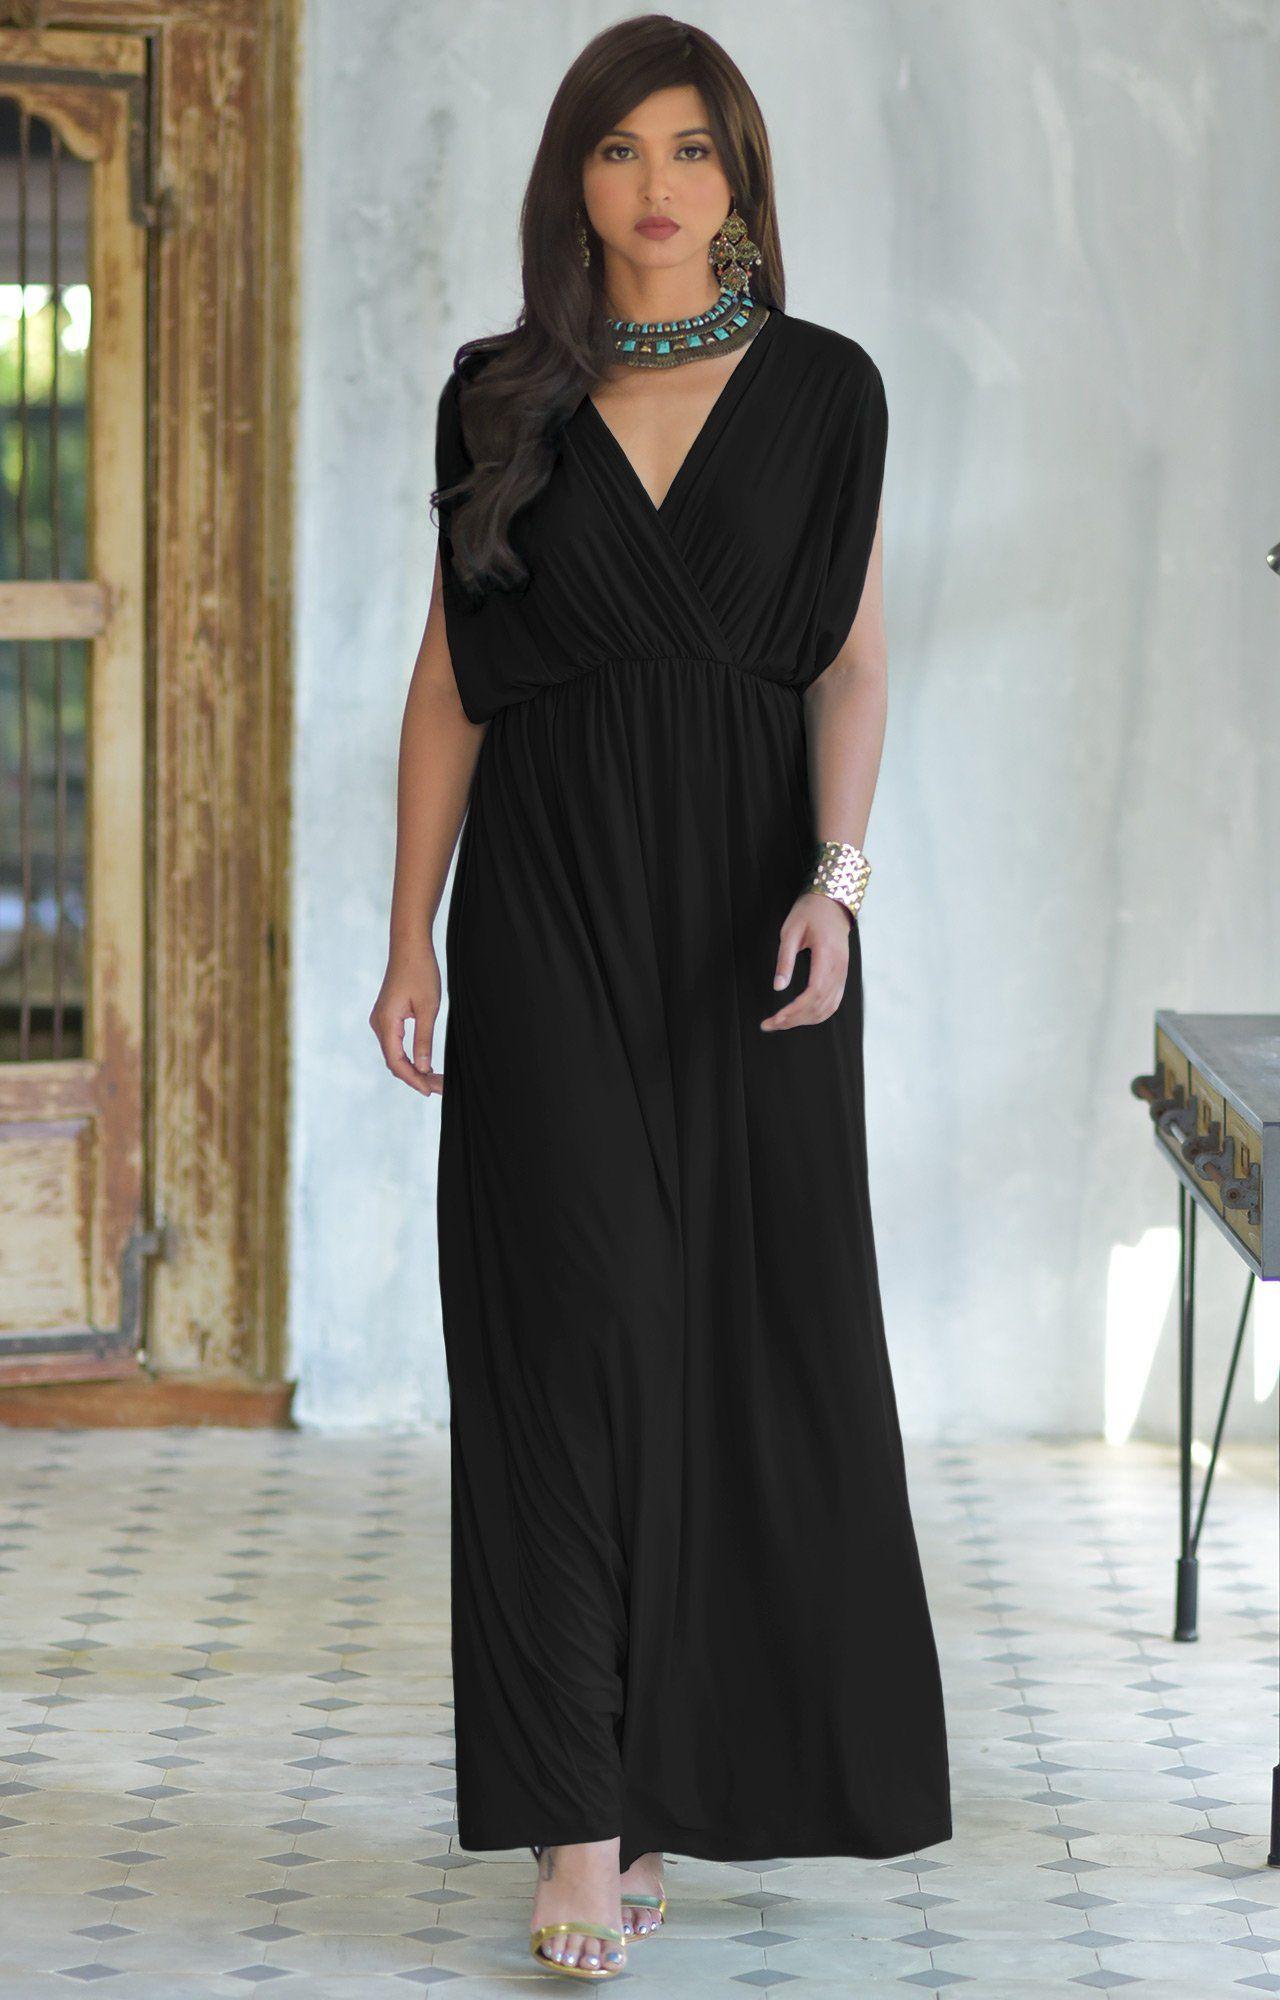 f6e733a5586 KOH KOH Womens Long Sexy Grecian Short Sleeve Summer Empire Bridesmaid  Bridesmaids Wedding Guest Casual Party